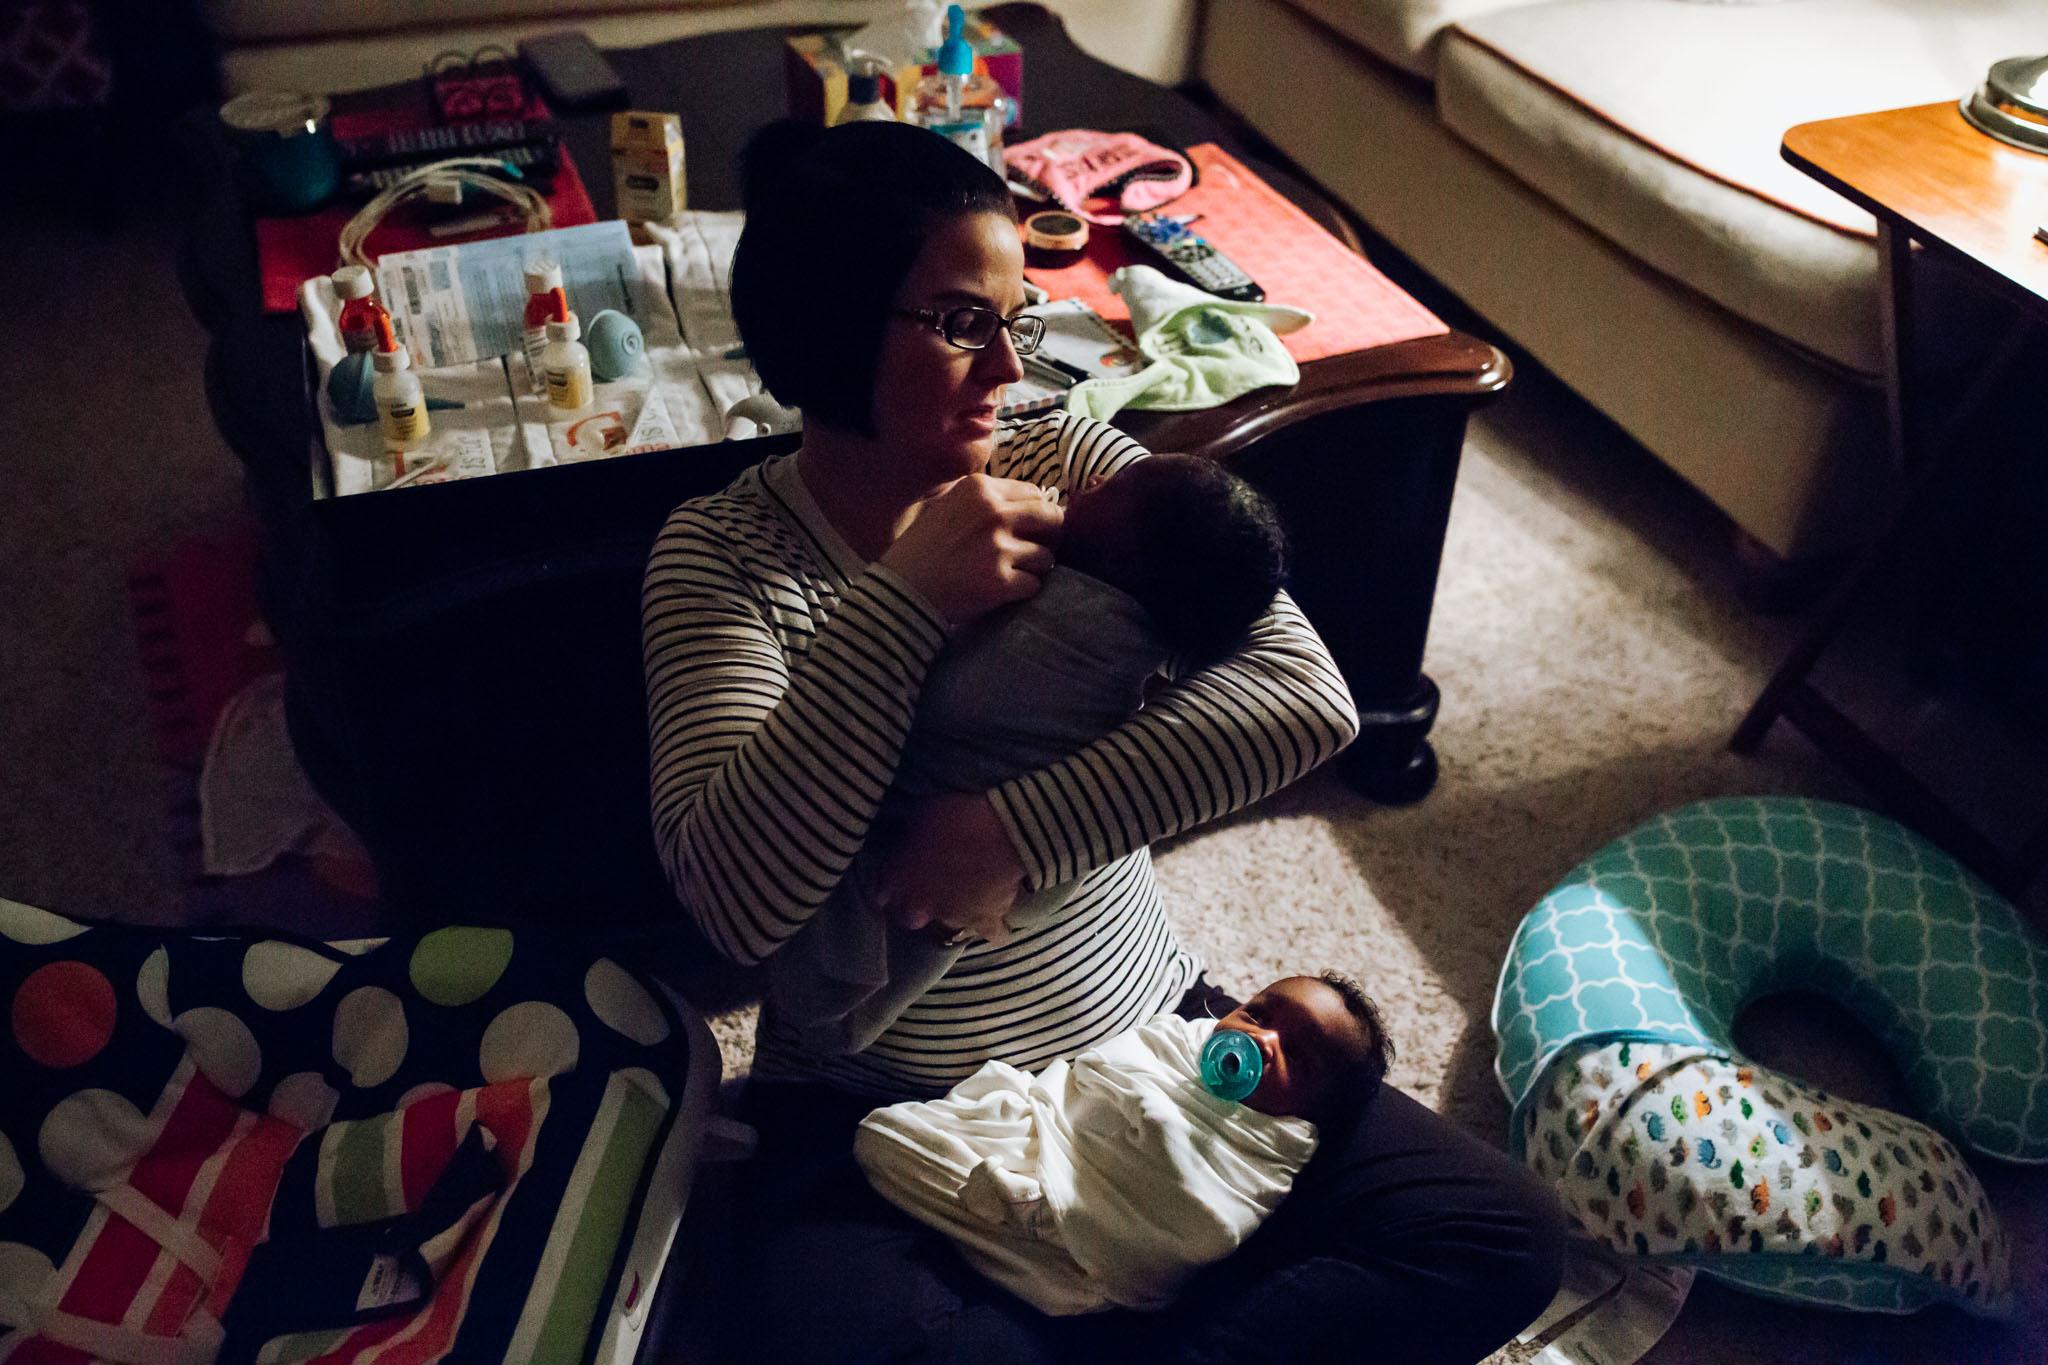 The_Night_in_the_life_ofa_postpartum_doula_KEDocumentary_Dallas19.jpg